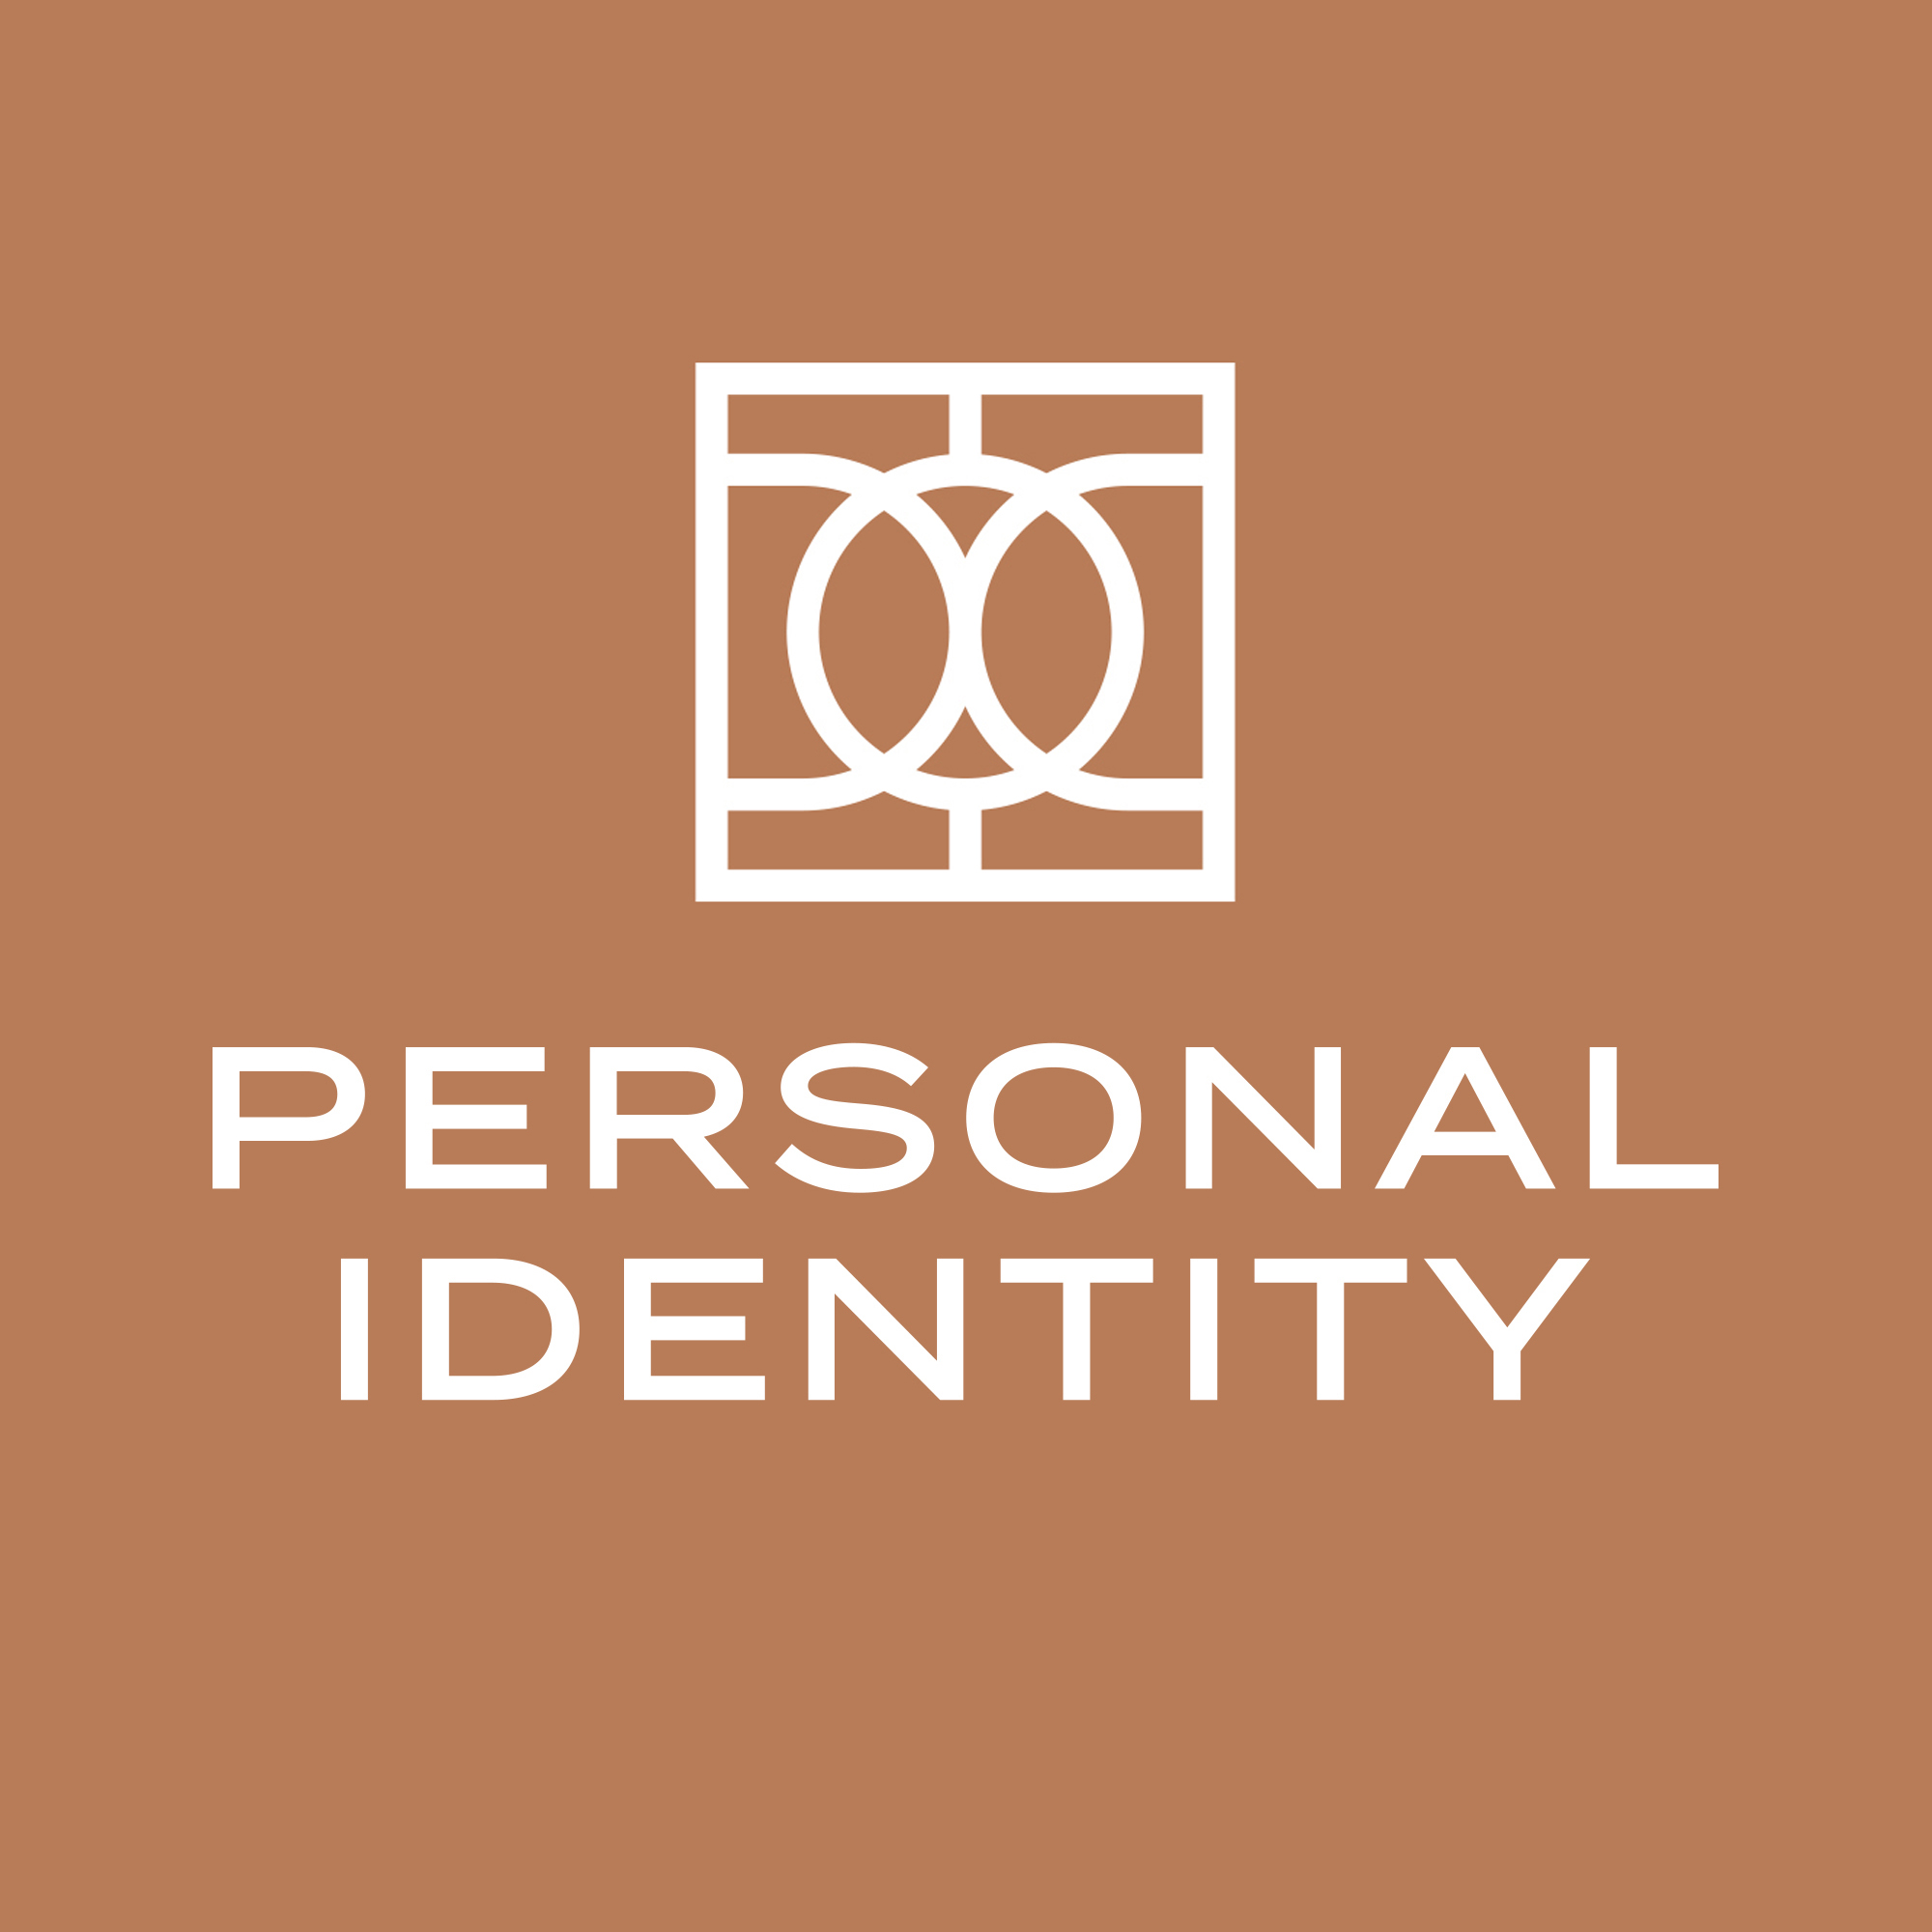 personal-identity-arredatori-parma-profile